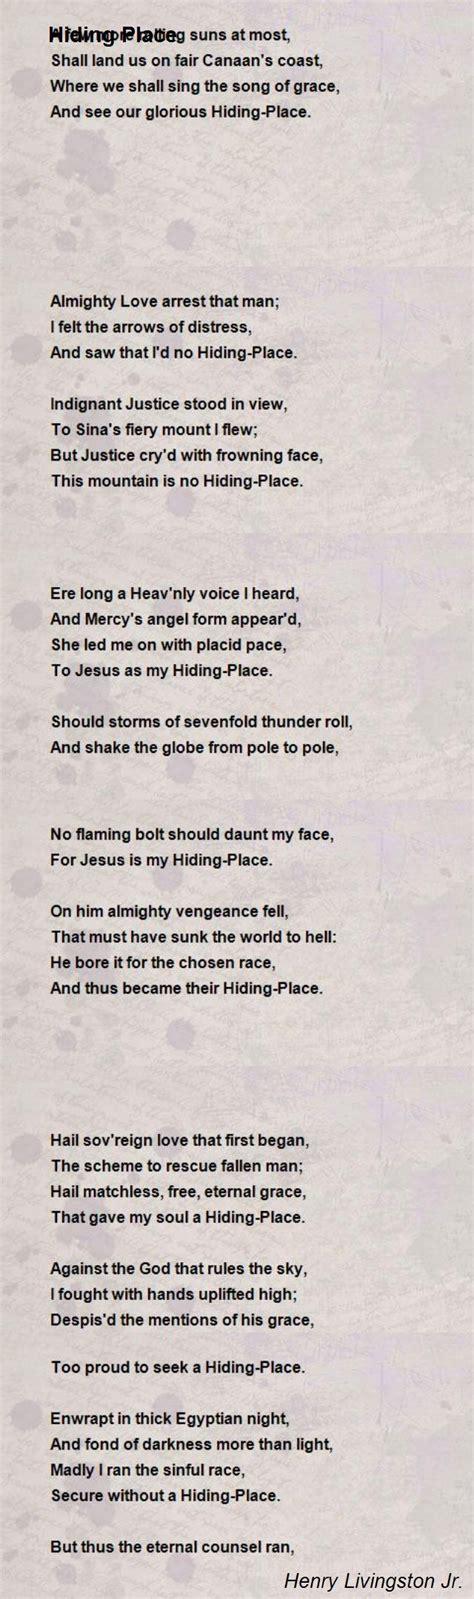 Poems About A Place Hiding Place Poem By Henry Livingston Jr Poem